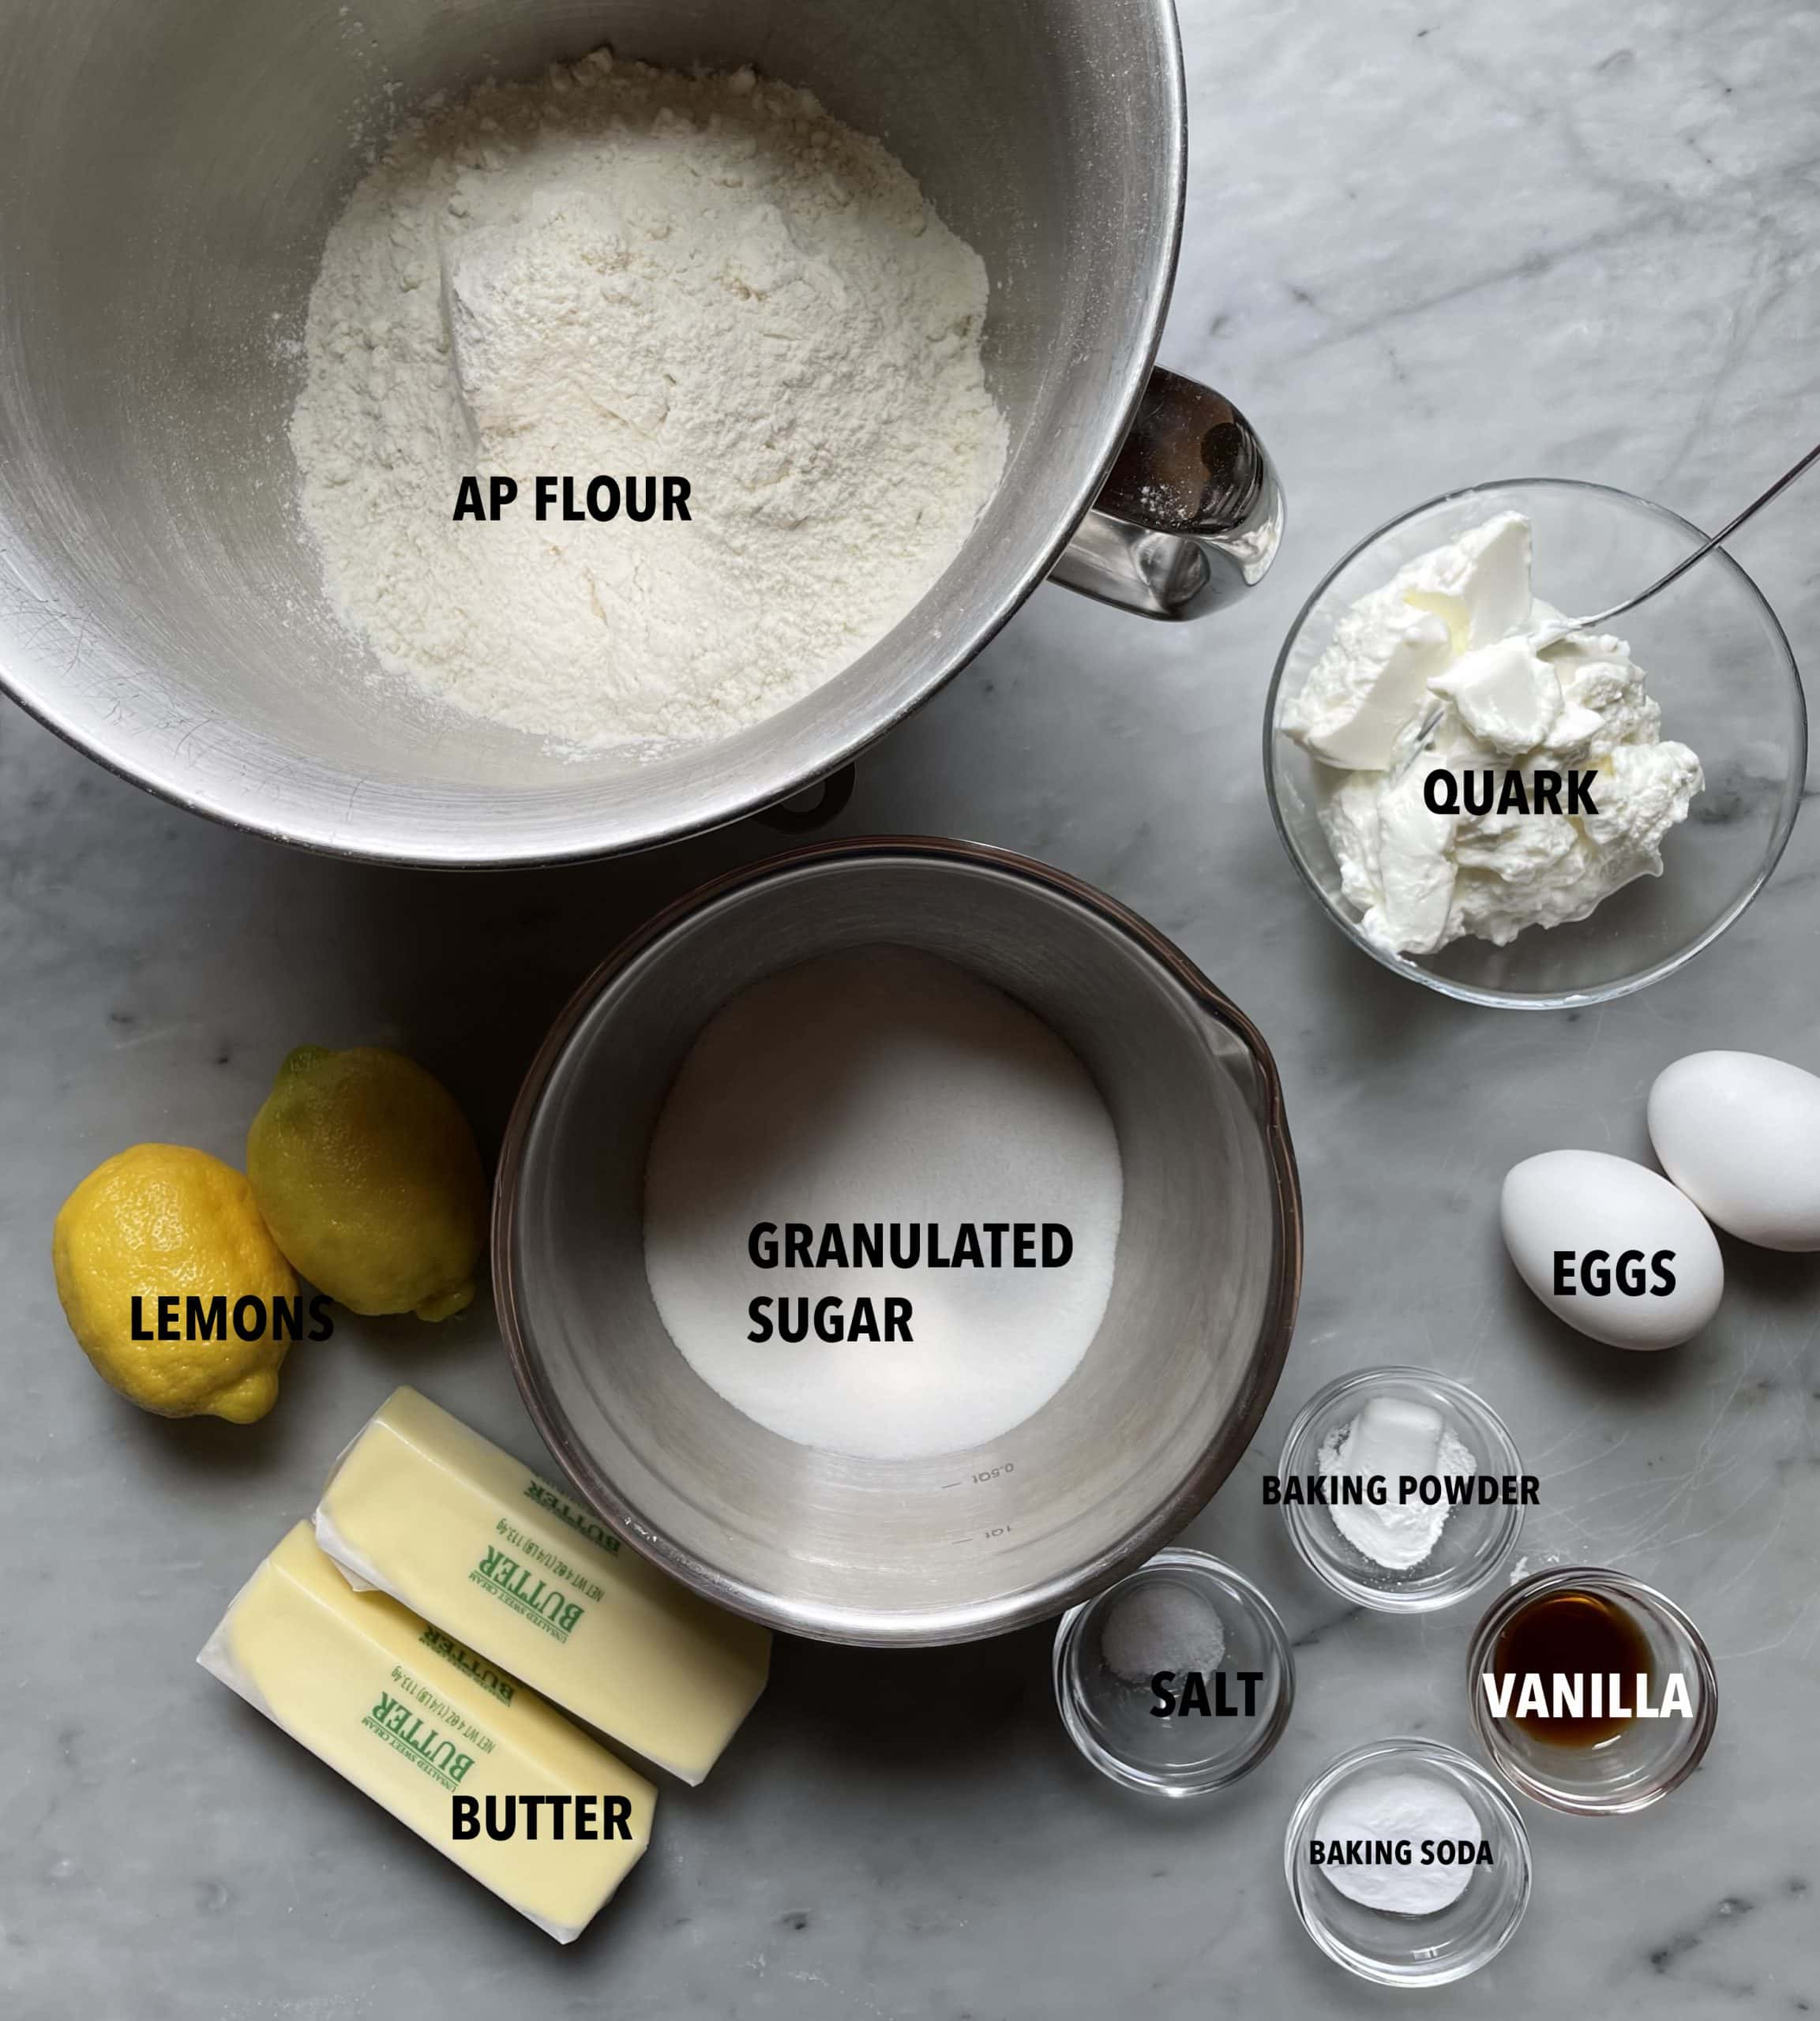 Image of the ingredients needed for Lemon Amerikaner